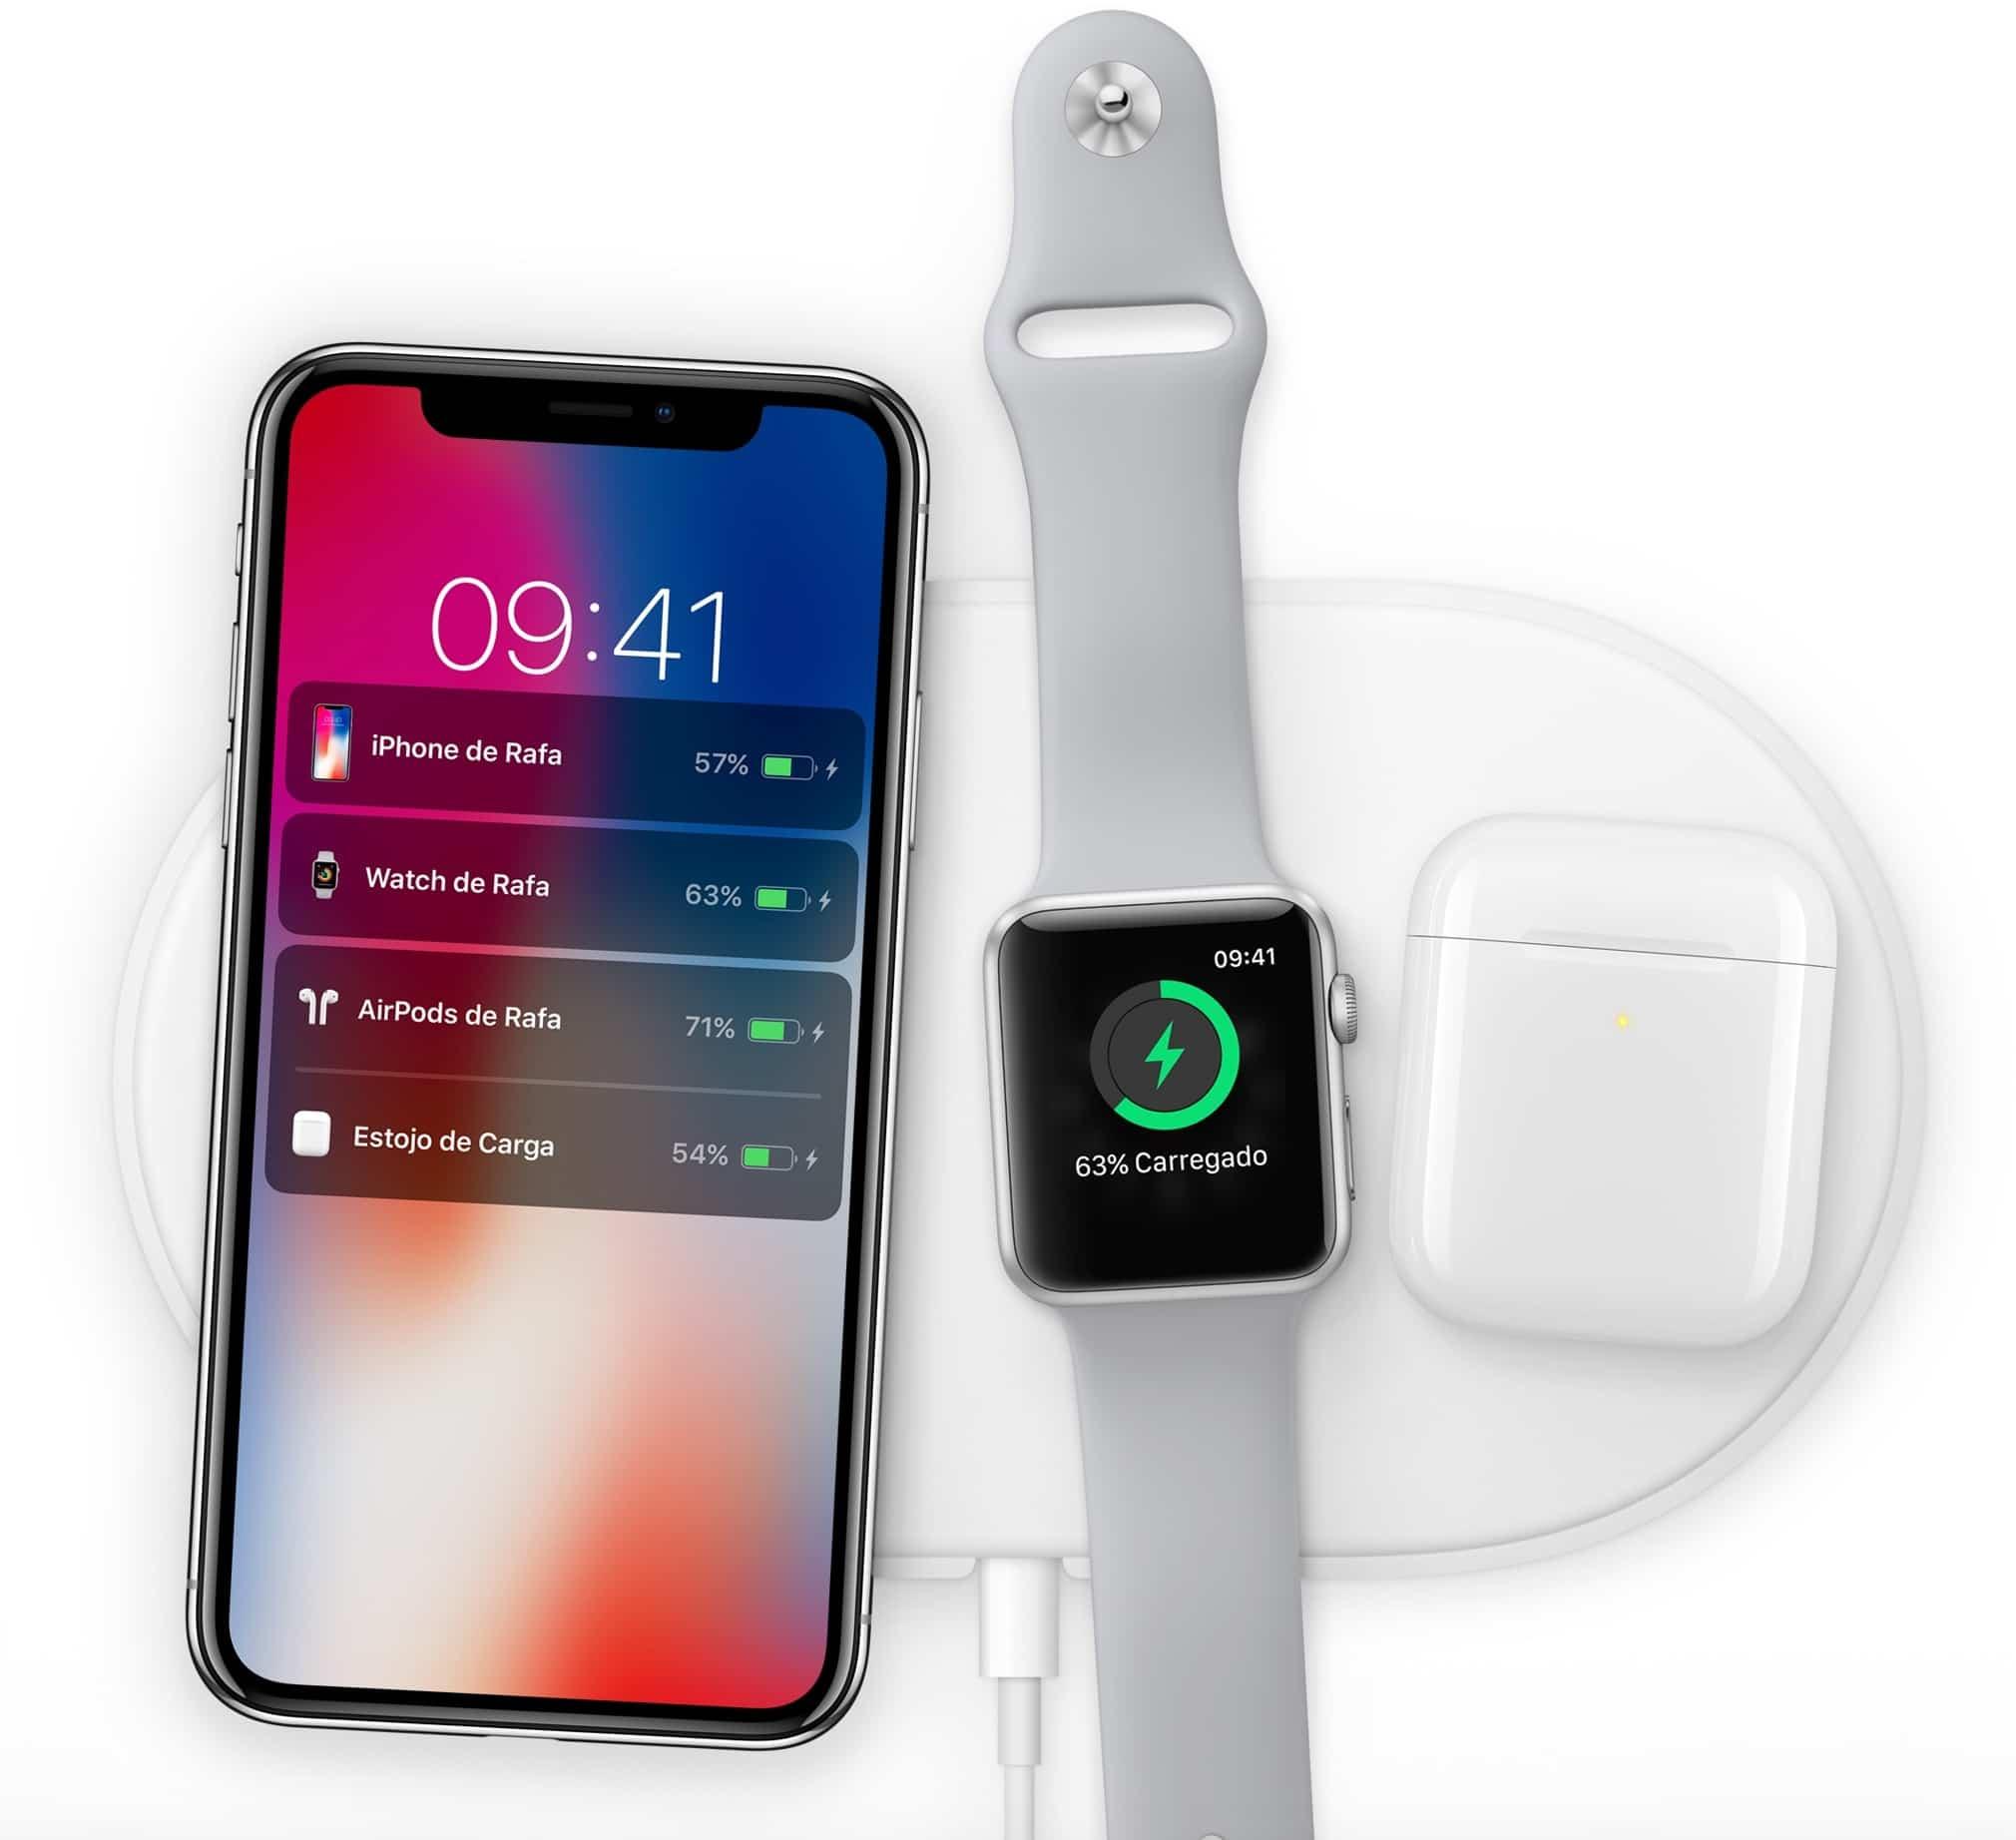 Base de recarga AirPower com iPhone X, Apple Watch Series 3 e AirPods